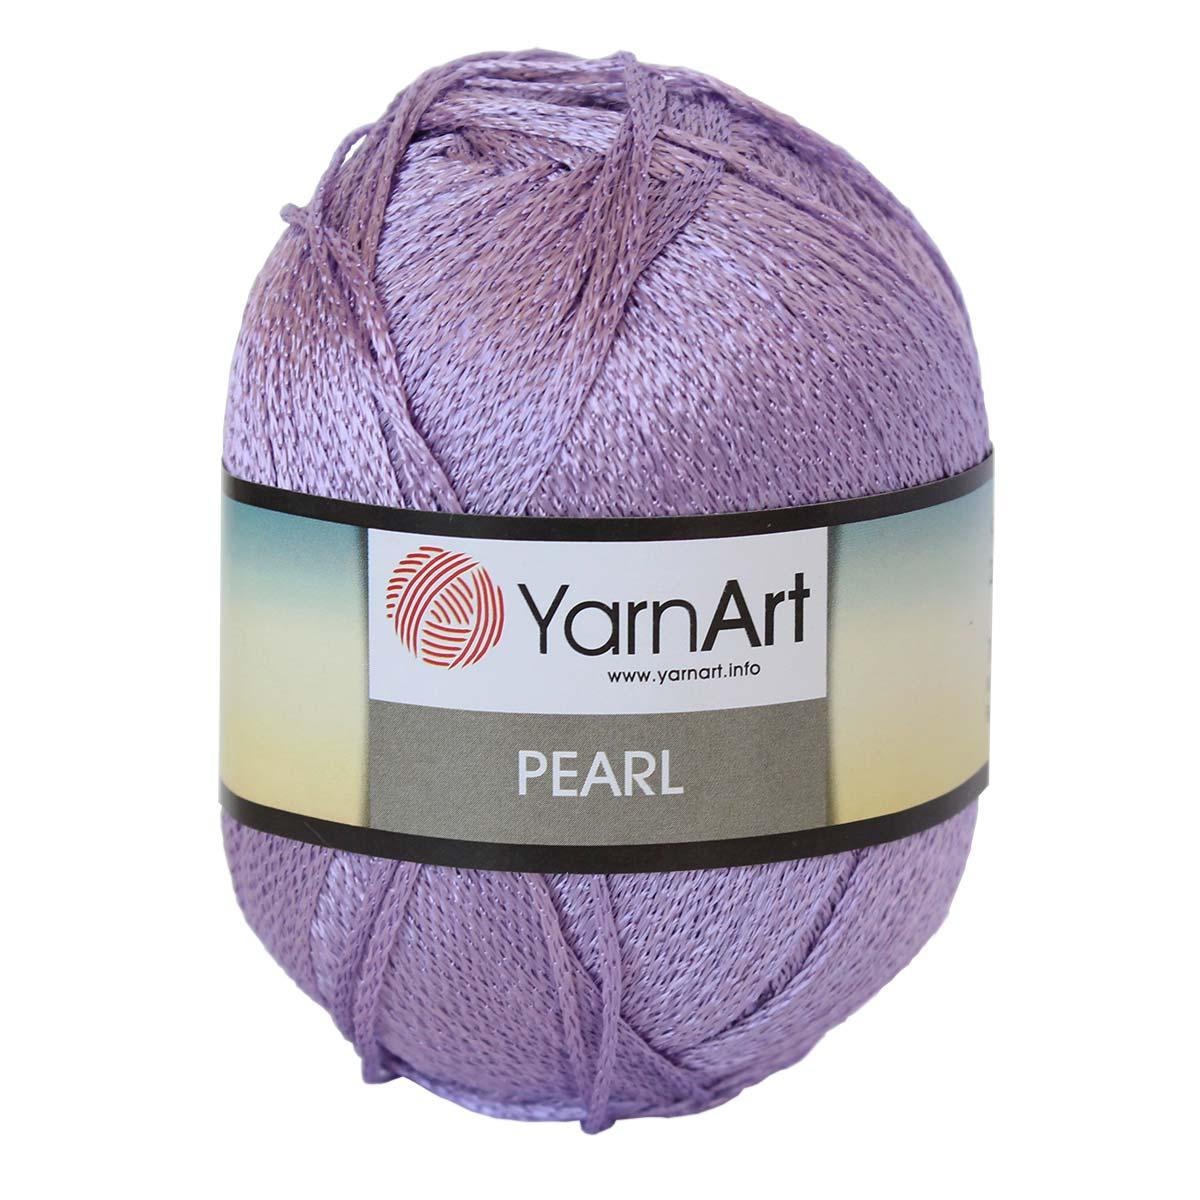 Пряжа YarnArt 'Pearl' 90гр. 270м. (100%вискоза) ТУ